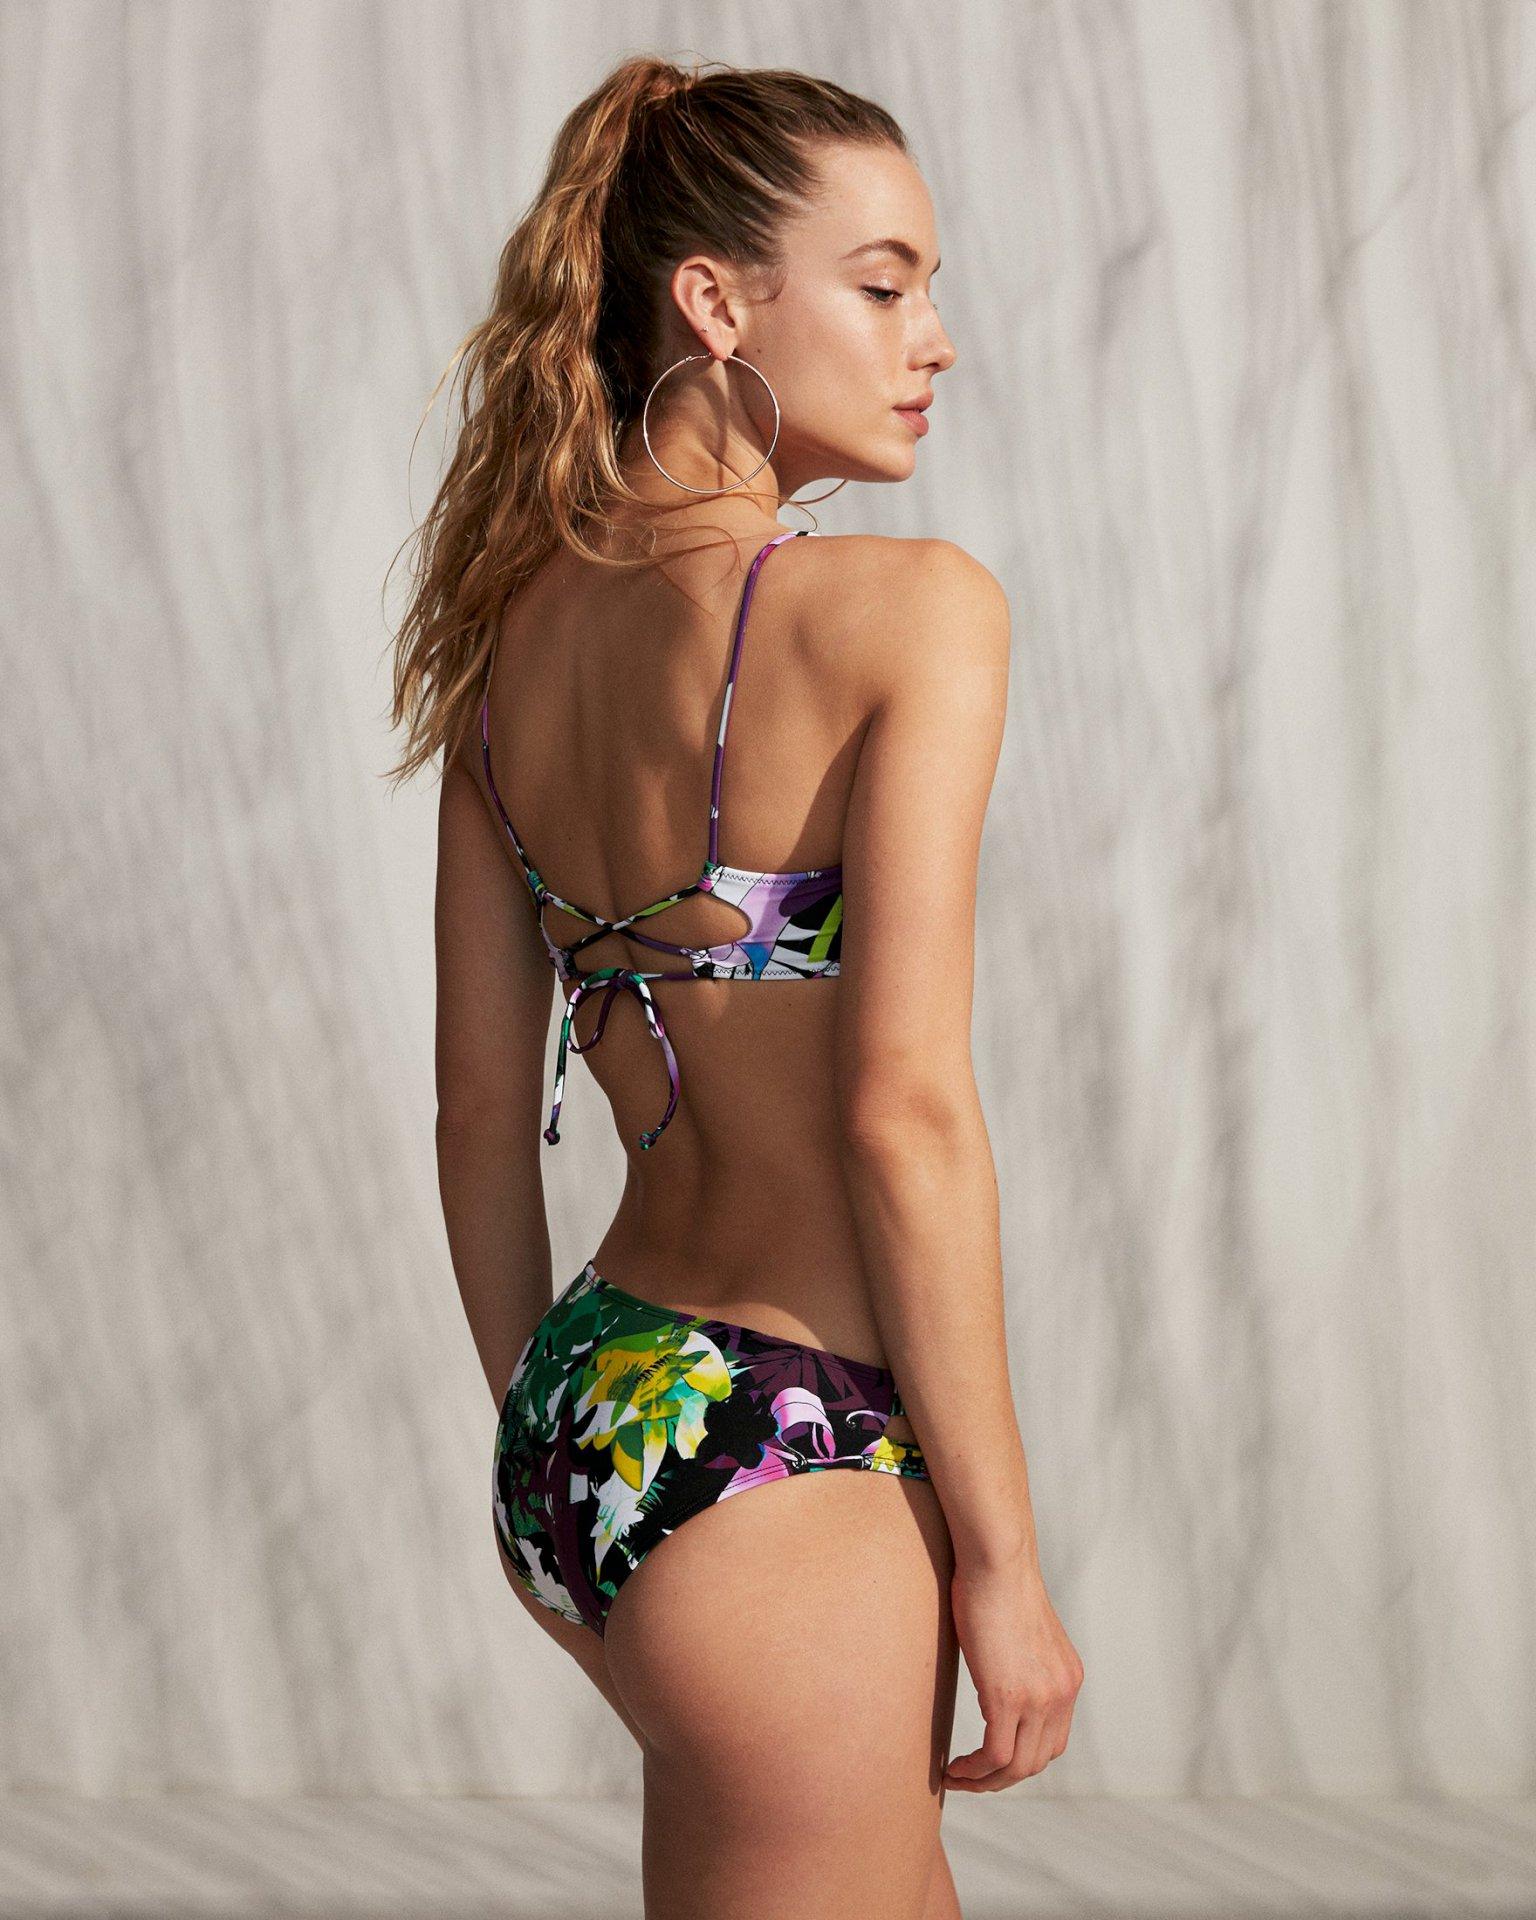 Stefanie bock sexy